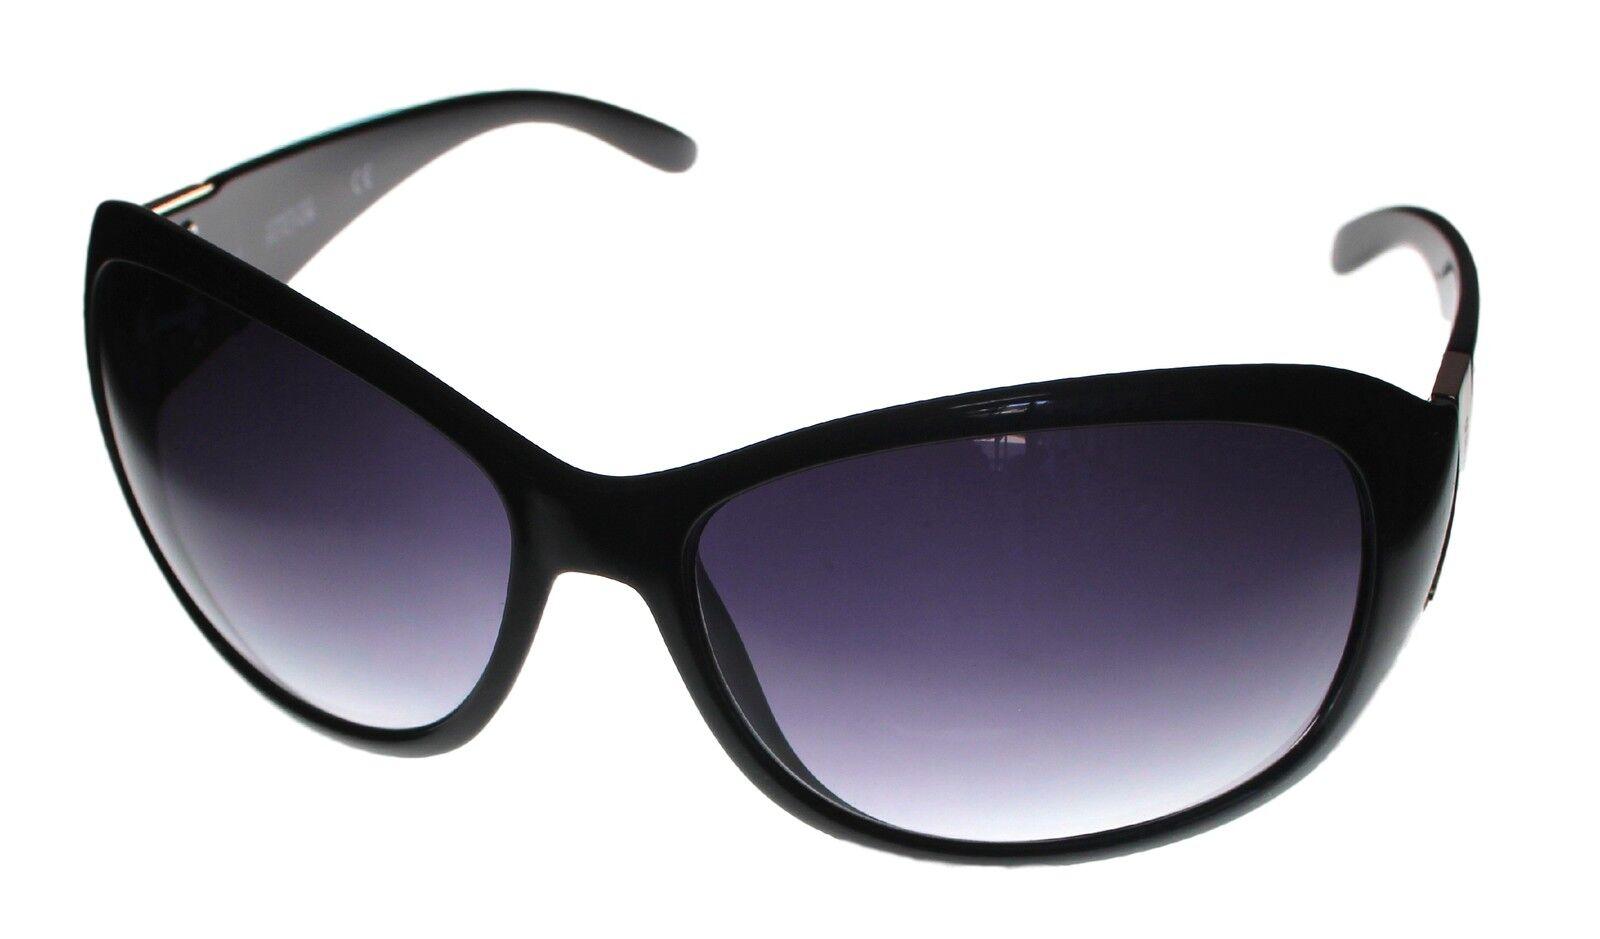 Gradient Lens KC1101 1B Kenneth Cole Reaction Sunglass Womens Black Rectangle